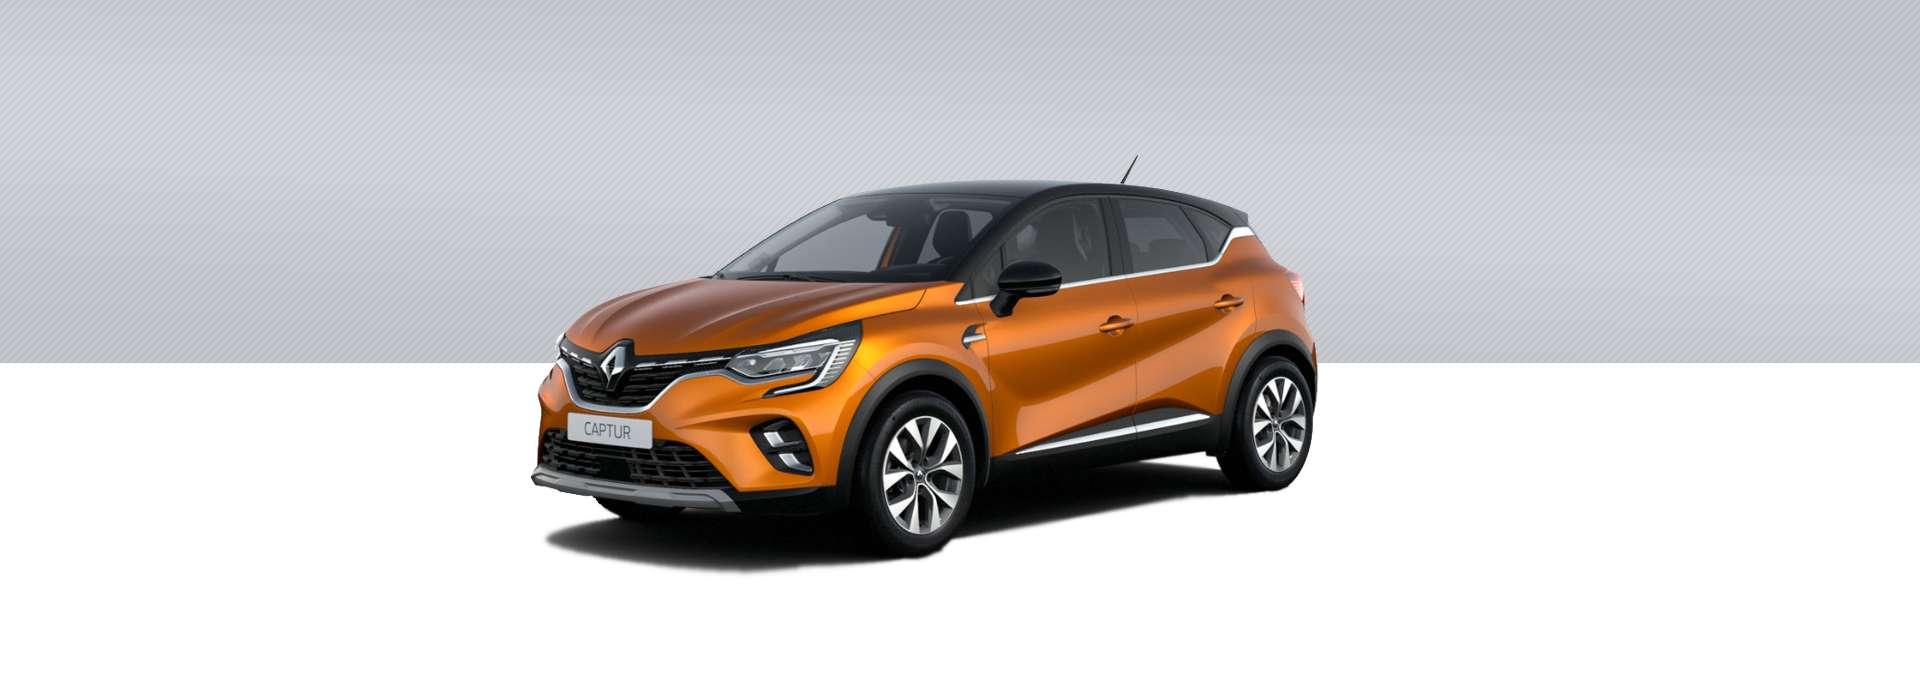 Renault NUEVO CAPTUR